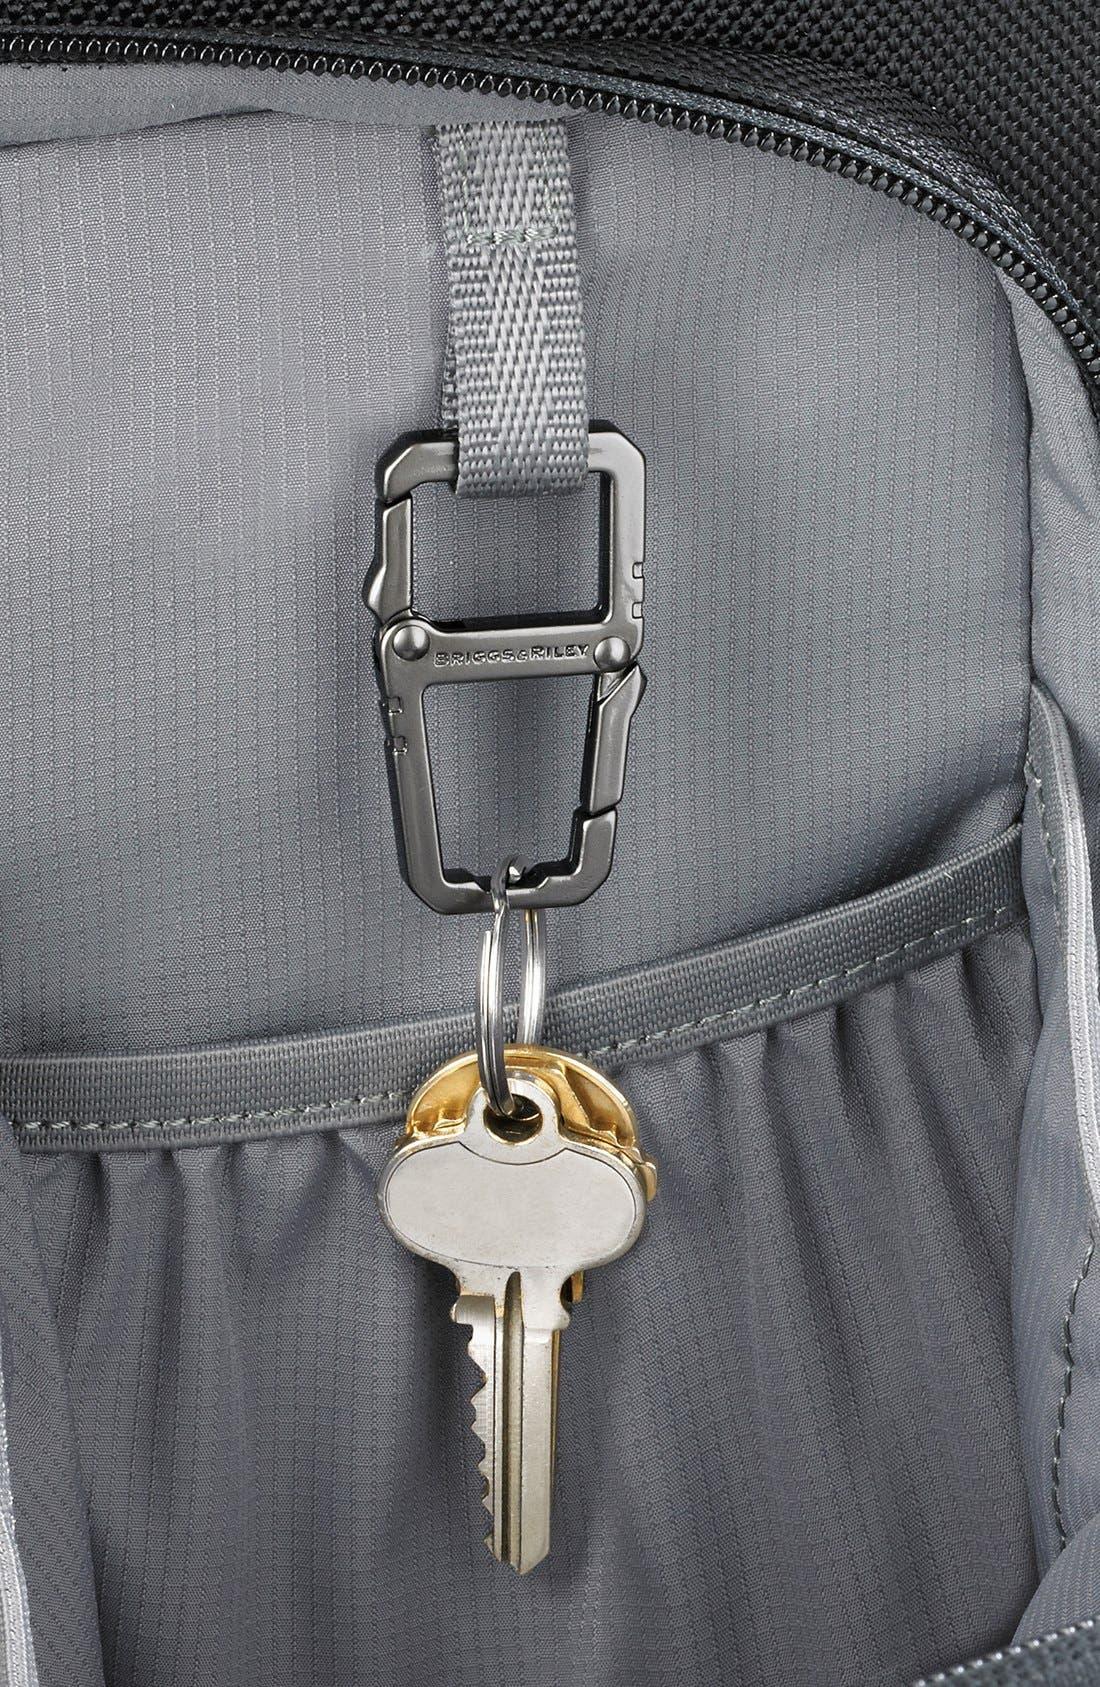 Medium Ballistic Nylon Backpack,                             Alternate thumbnail 2, color,